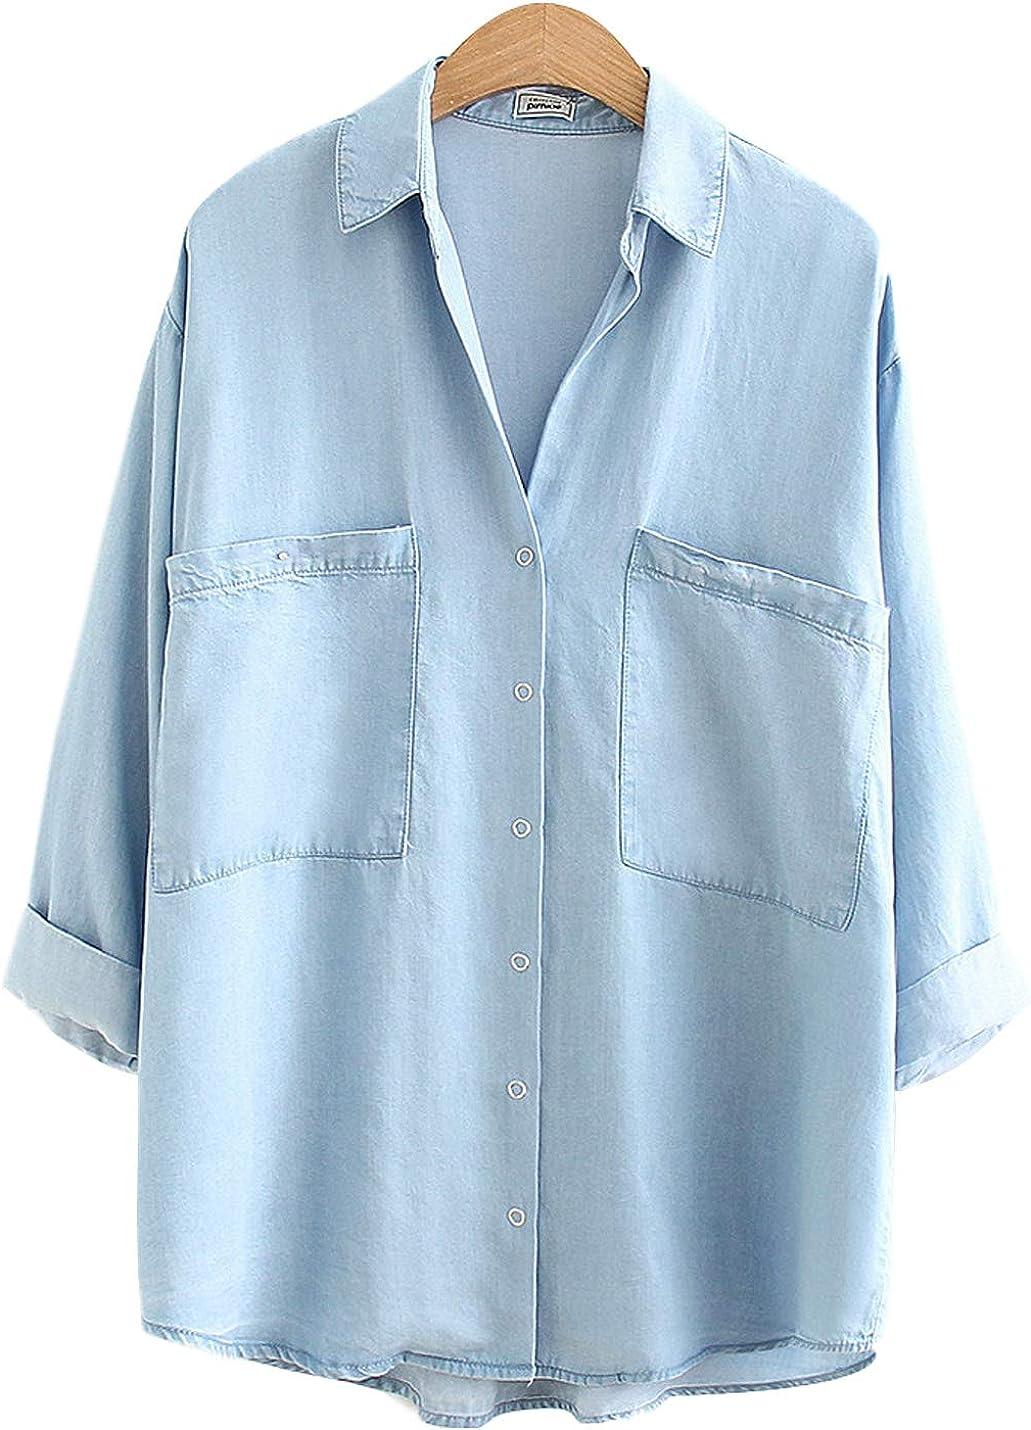 Genuine Yimoon Women's Soft Tencel Denim Button Baggy Collared Shirts specialty shop Do